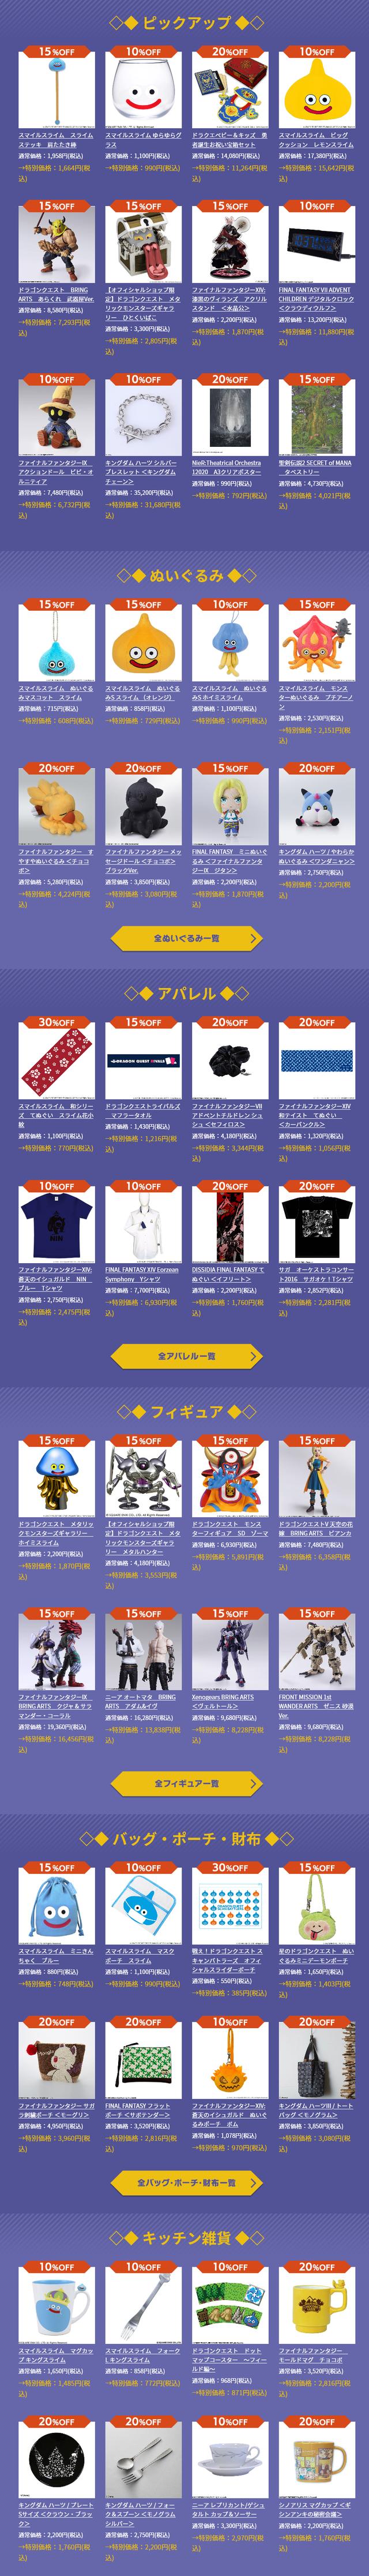 screenshot-store.jp.square-enix.com-2021.05.02-11_40_06